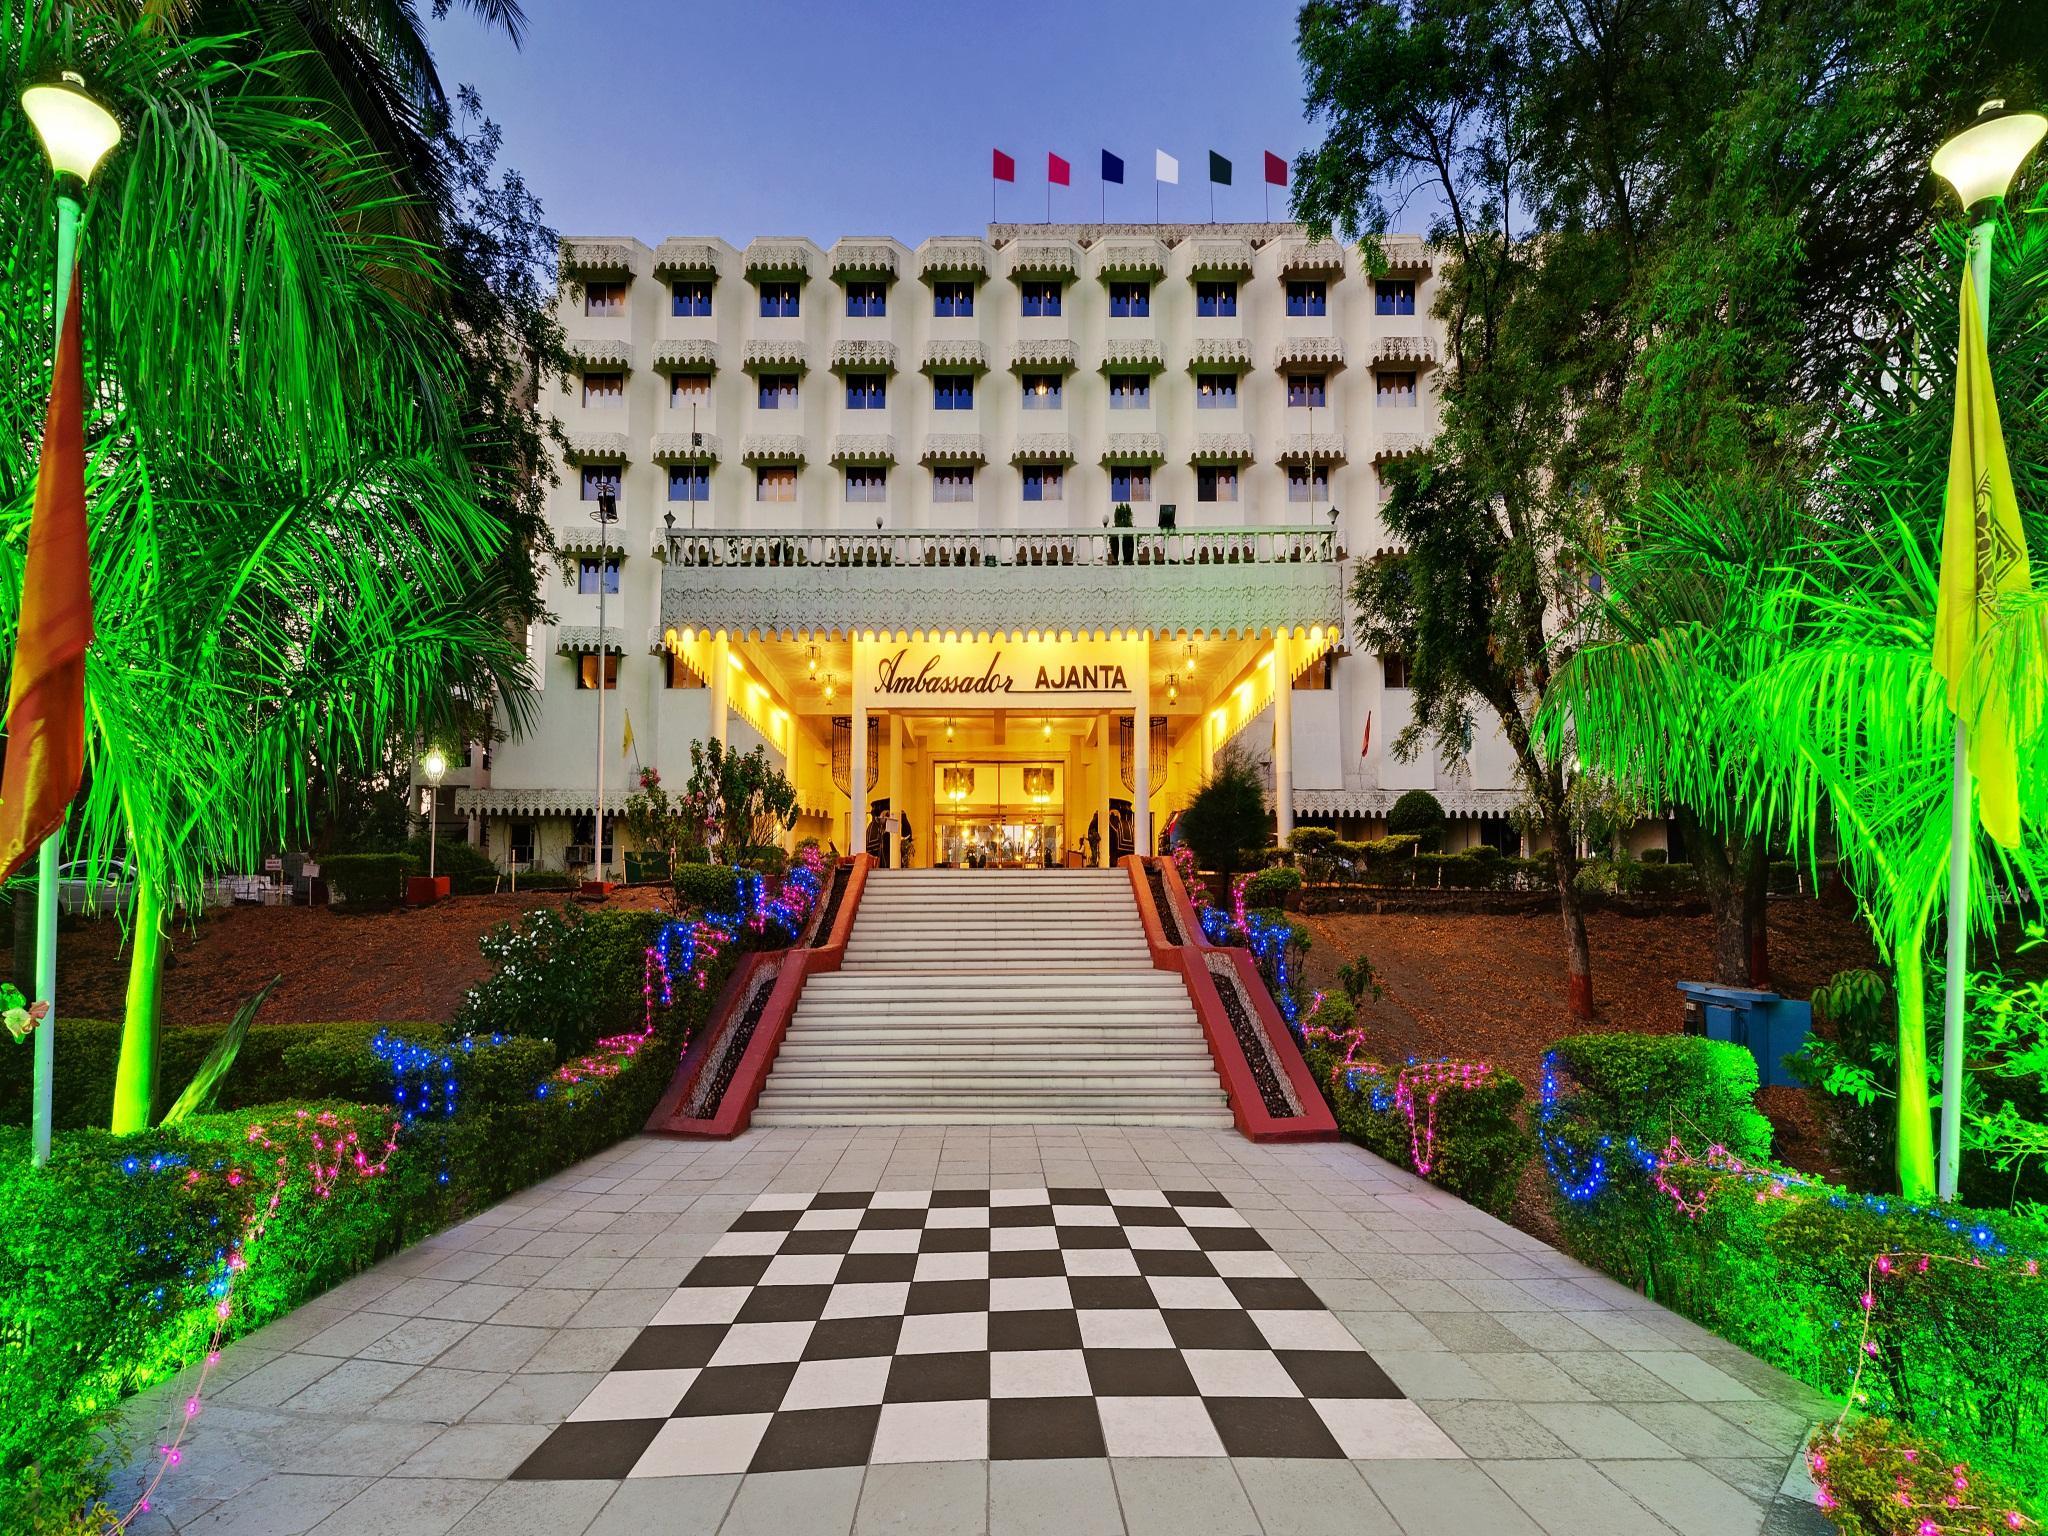 Hotel The Grand Pritam, Gandhinagar